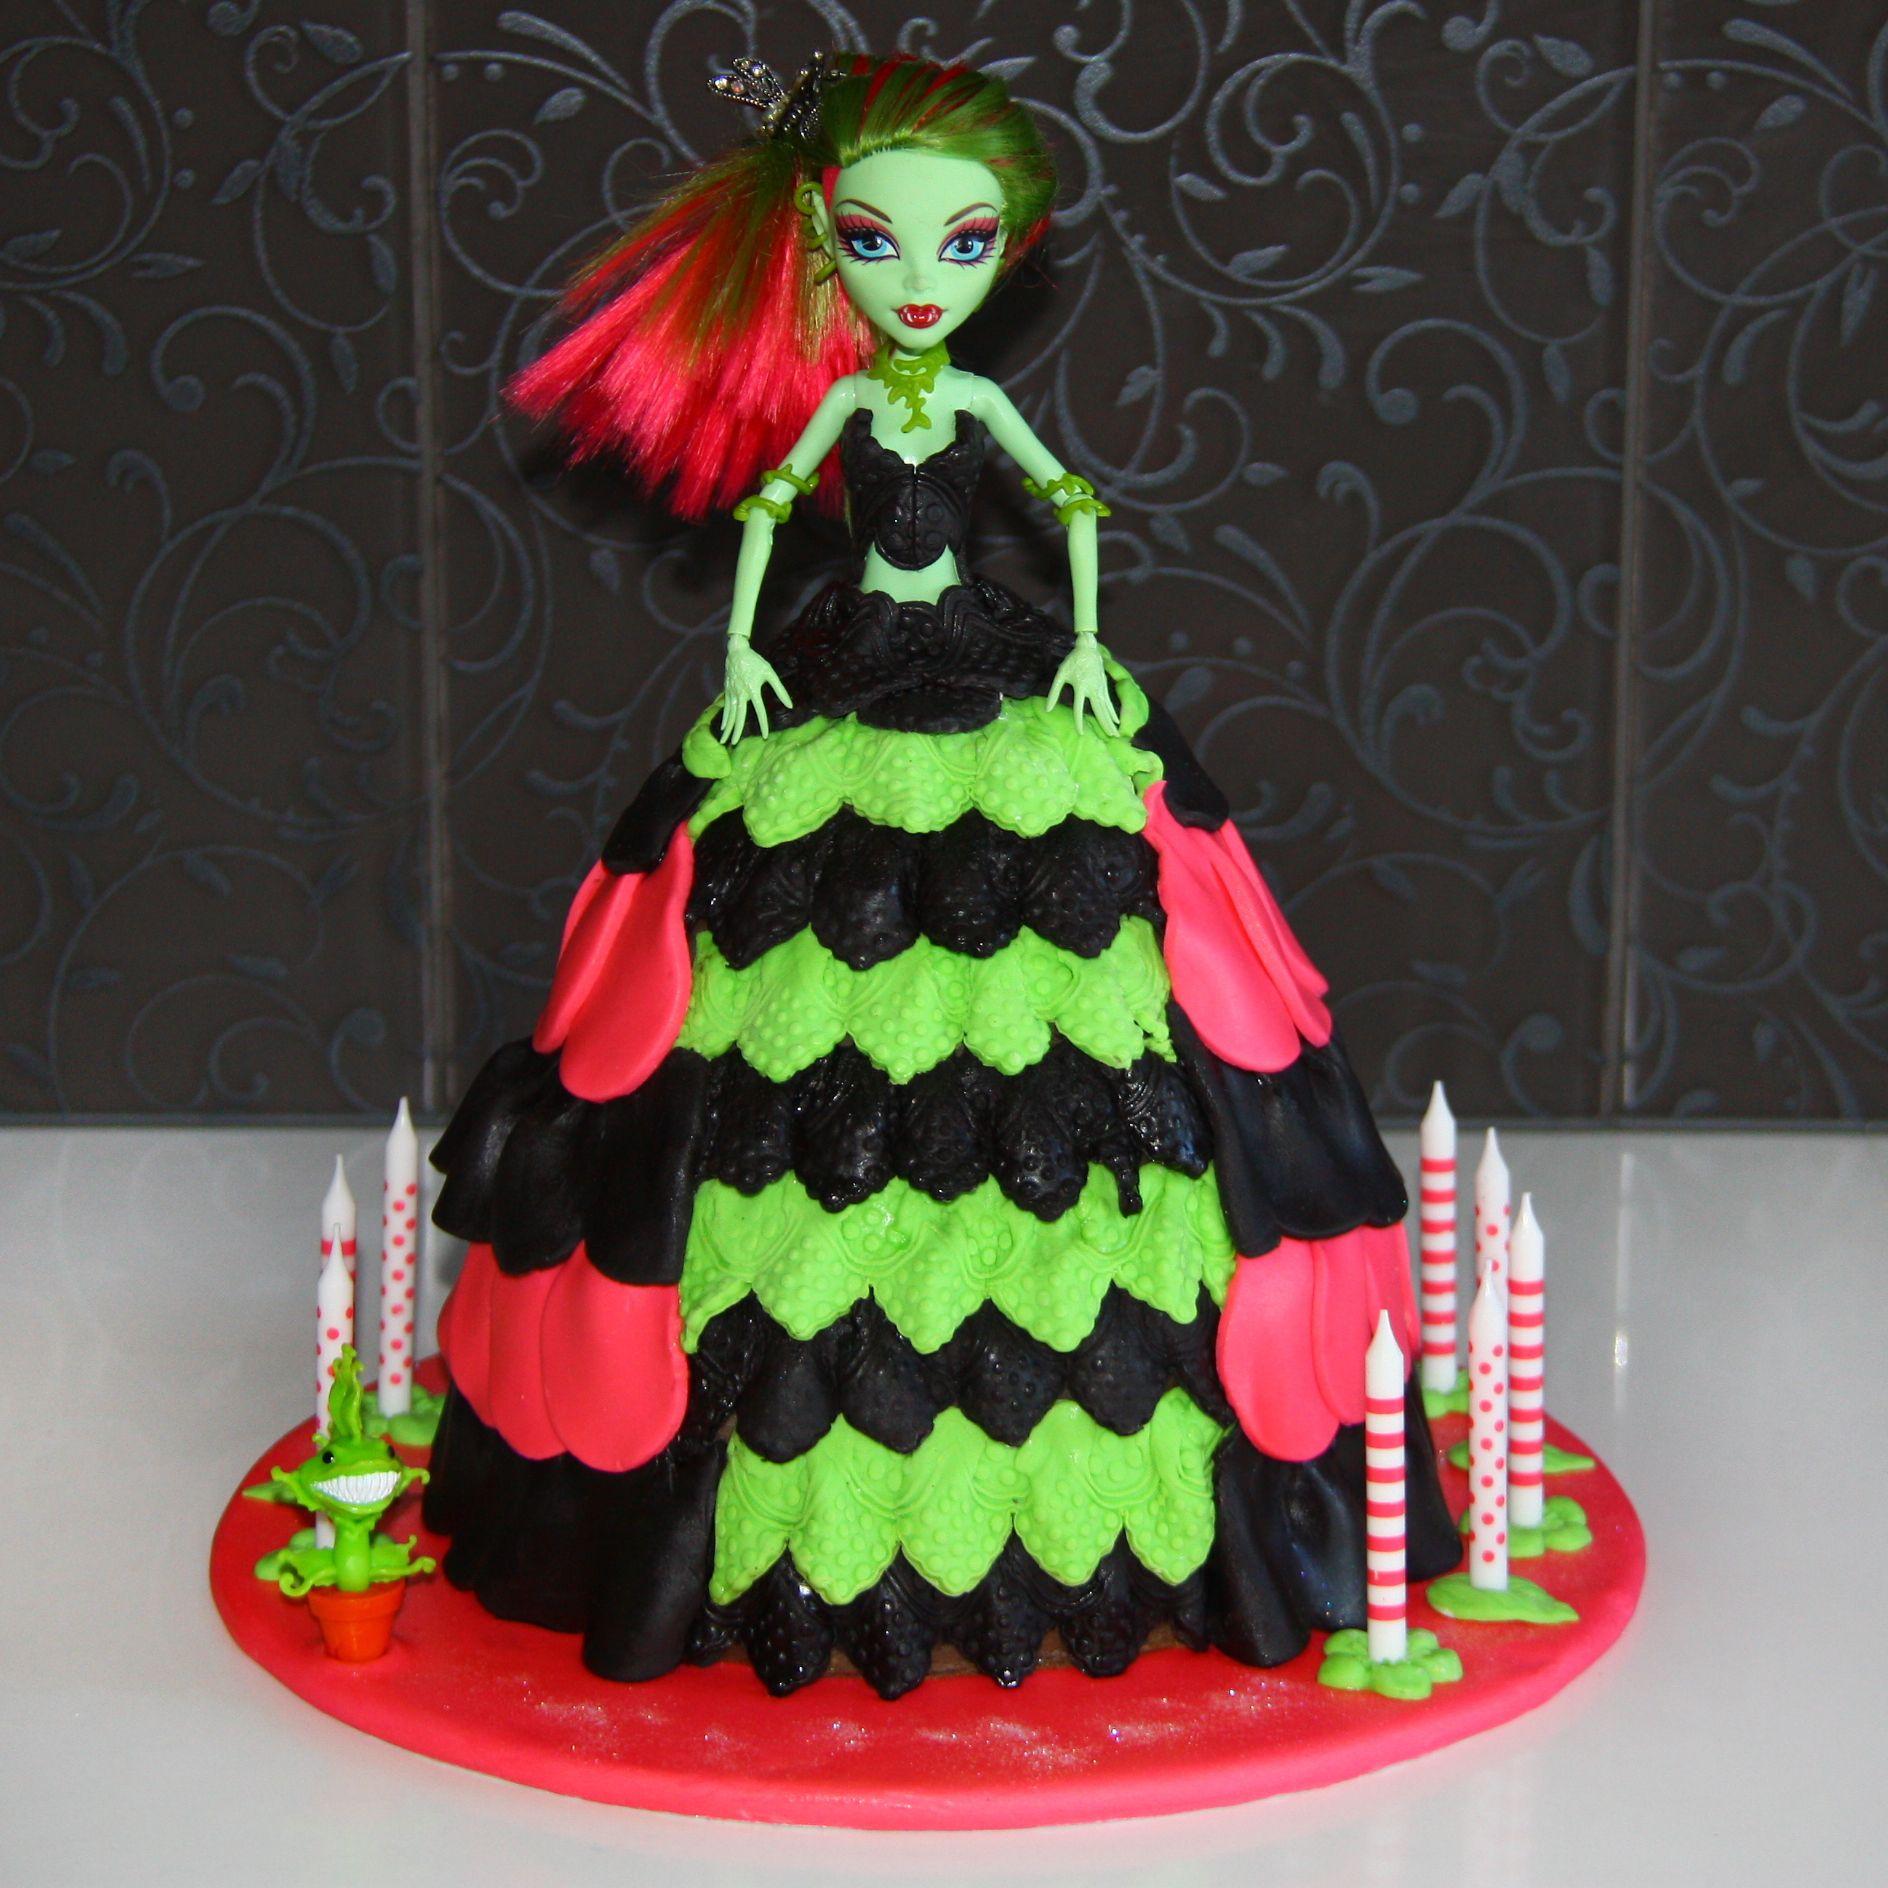 wwwsweetznetau Sweetz cakes brisbane Monster high Dolly varden